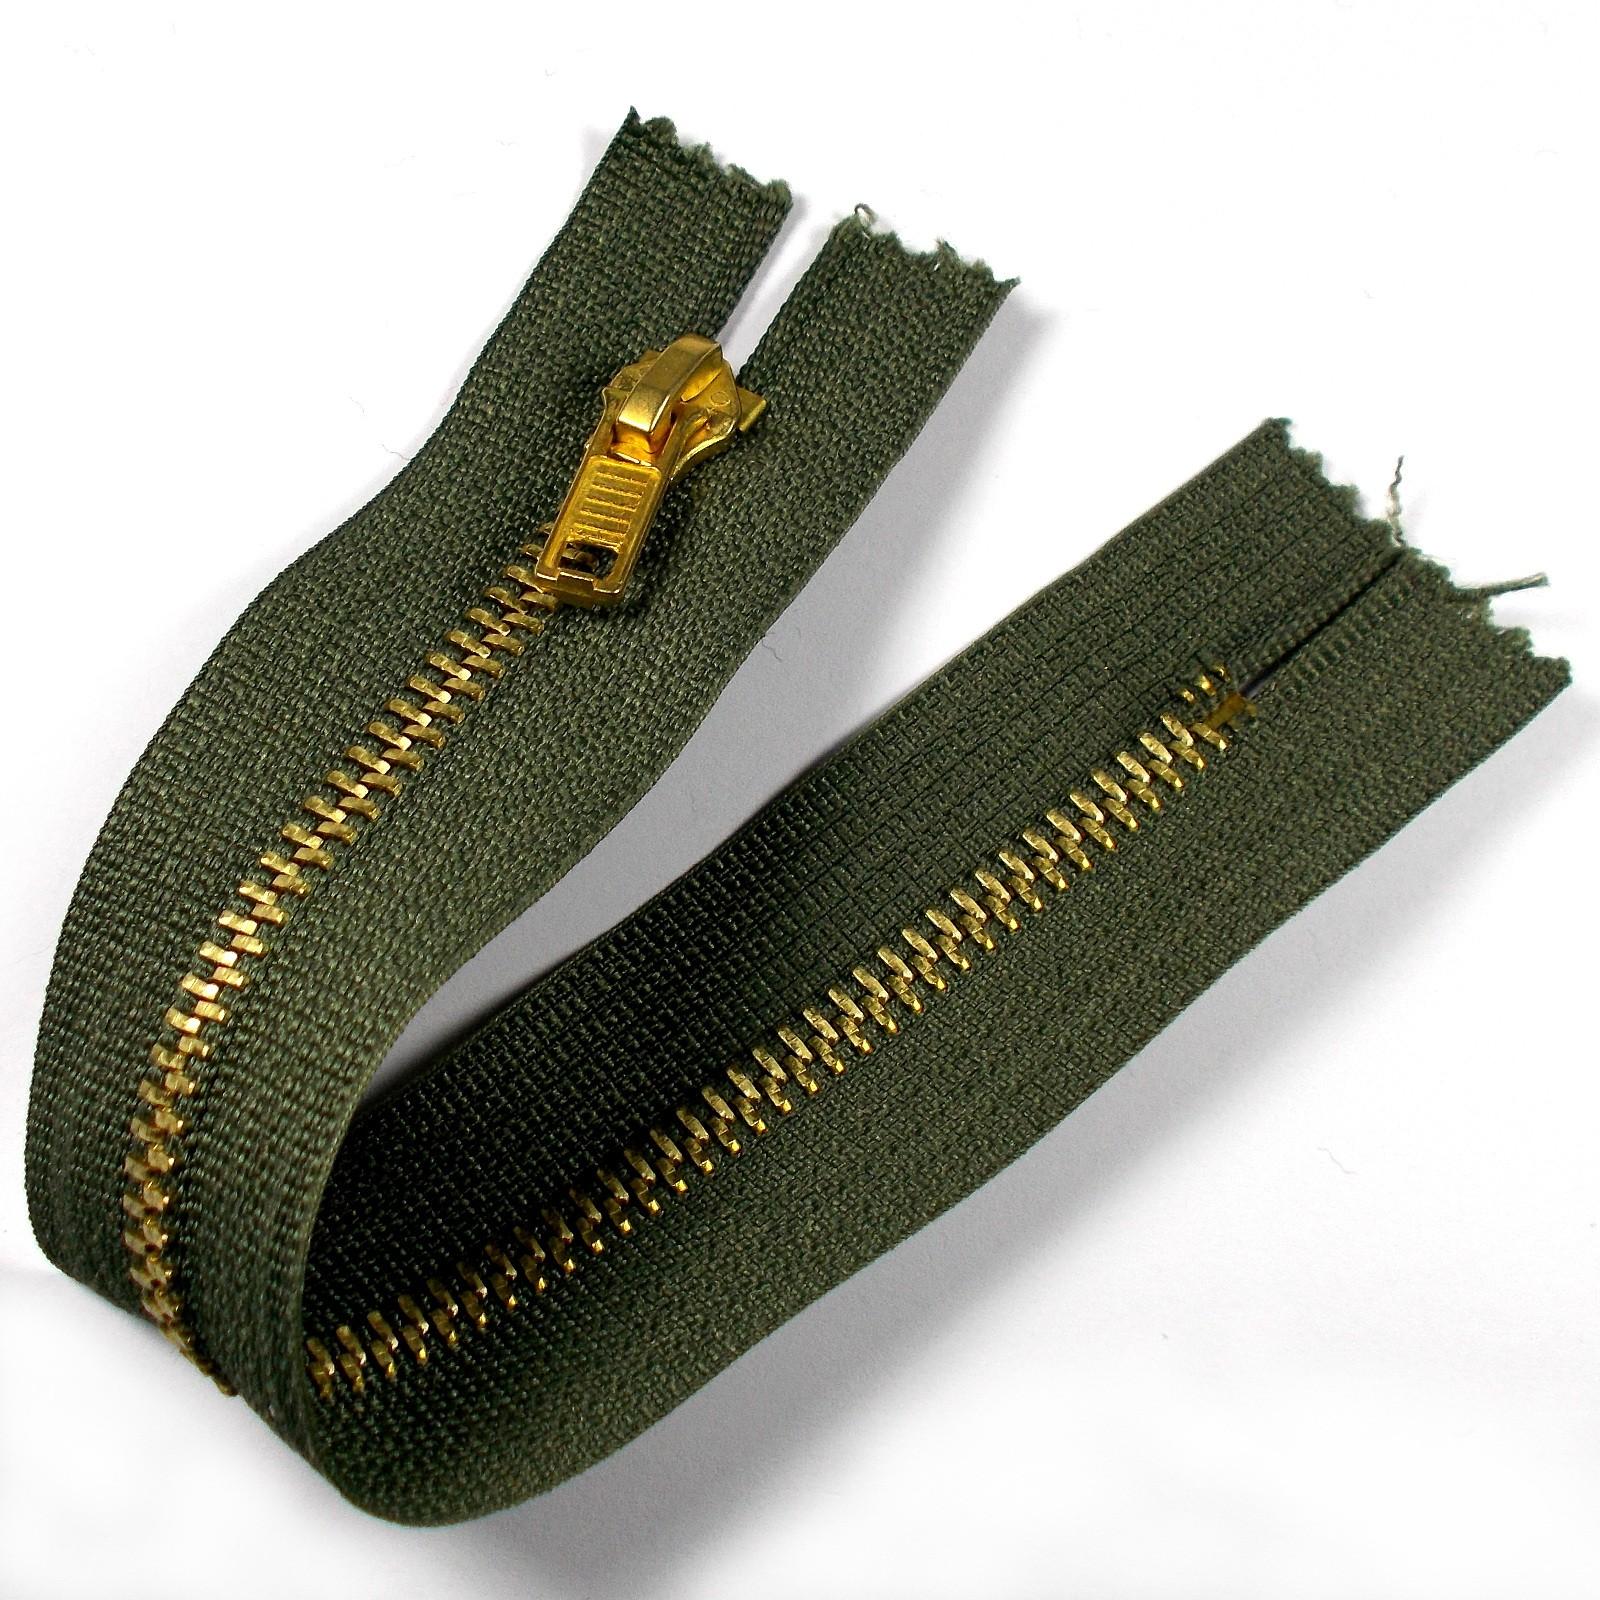 Gold Metal Trouser Jeans Zip Zipper 6 inch Green